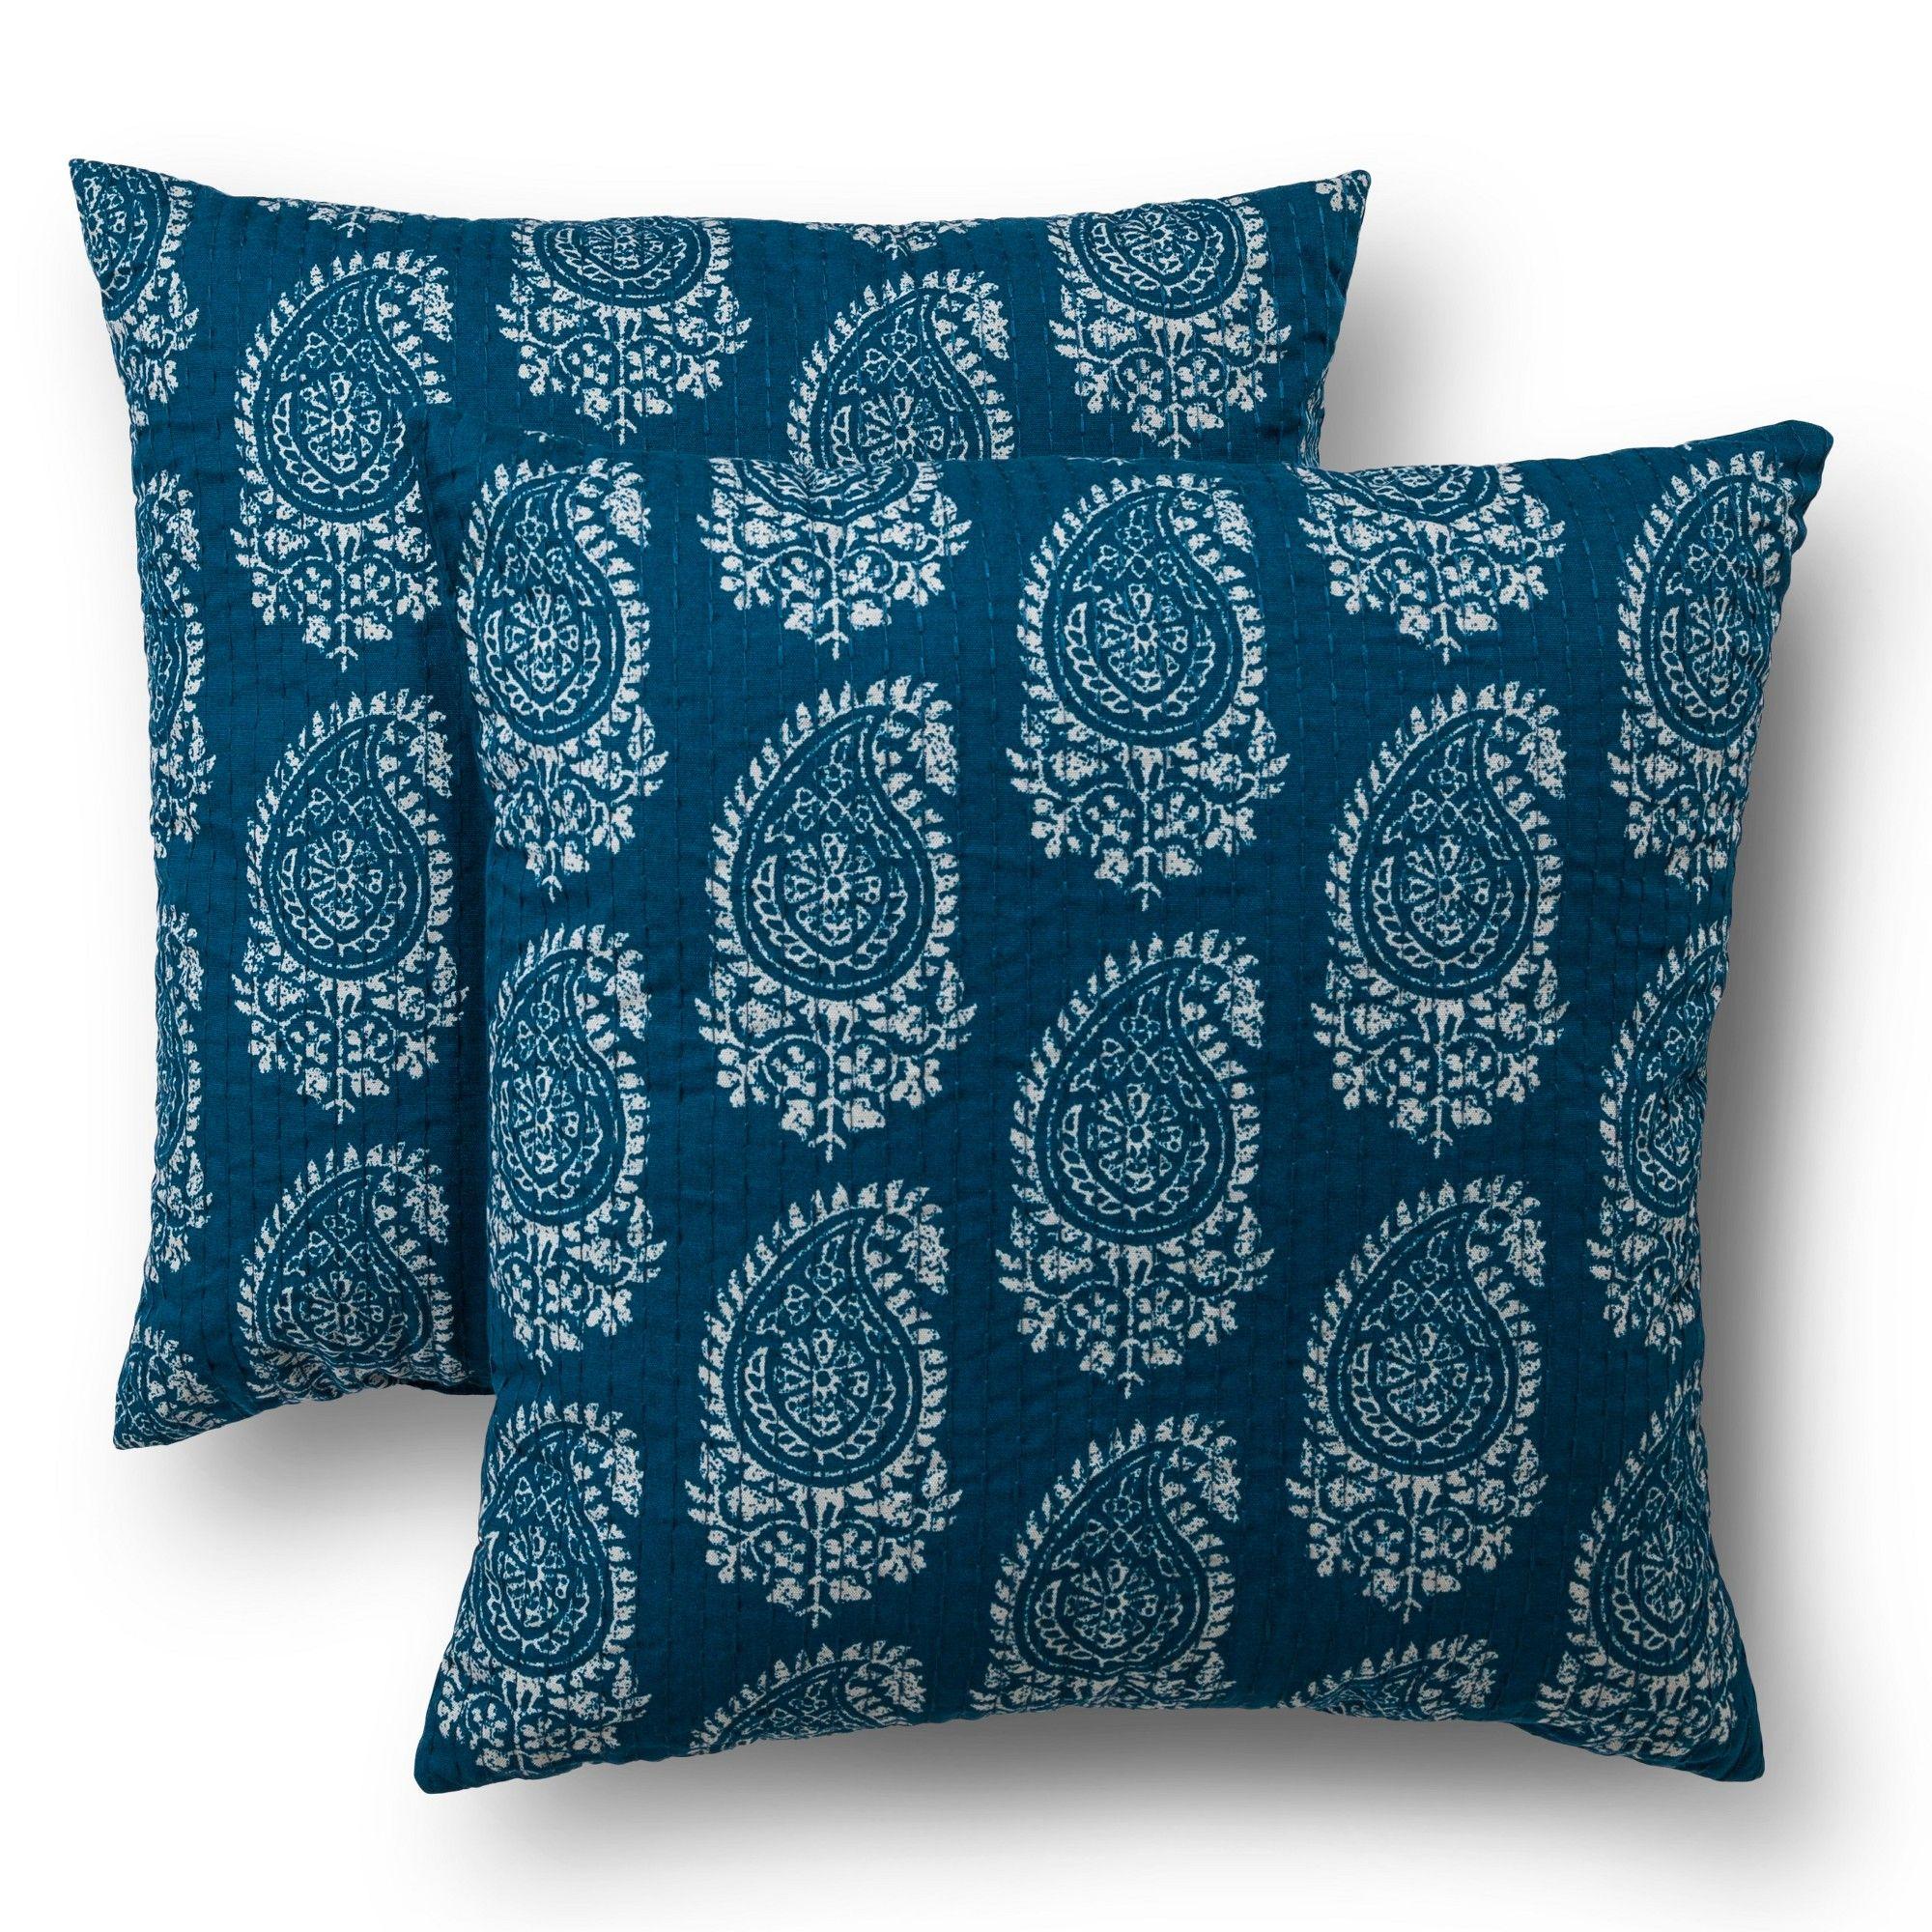 Threshold Blue Paisley Throw Pillow Set 2 Pack (18 X18 )